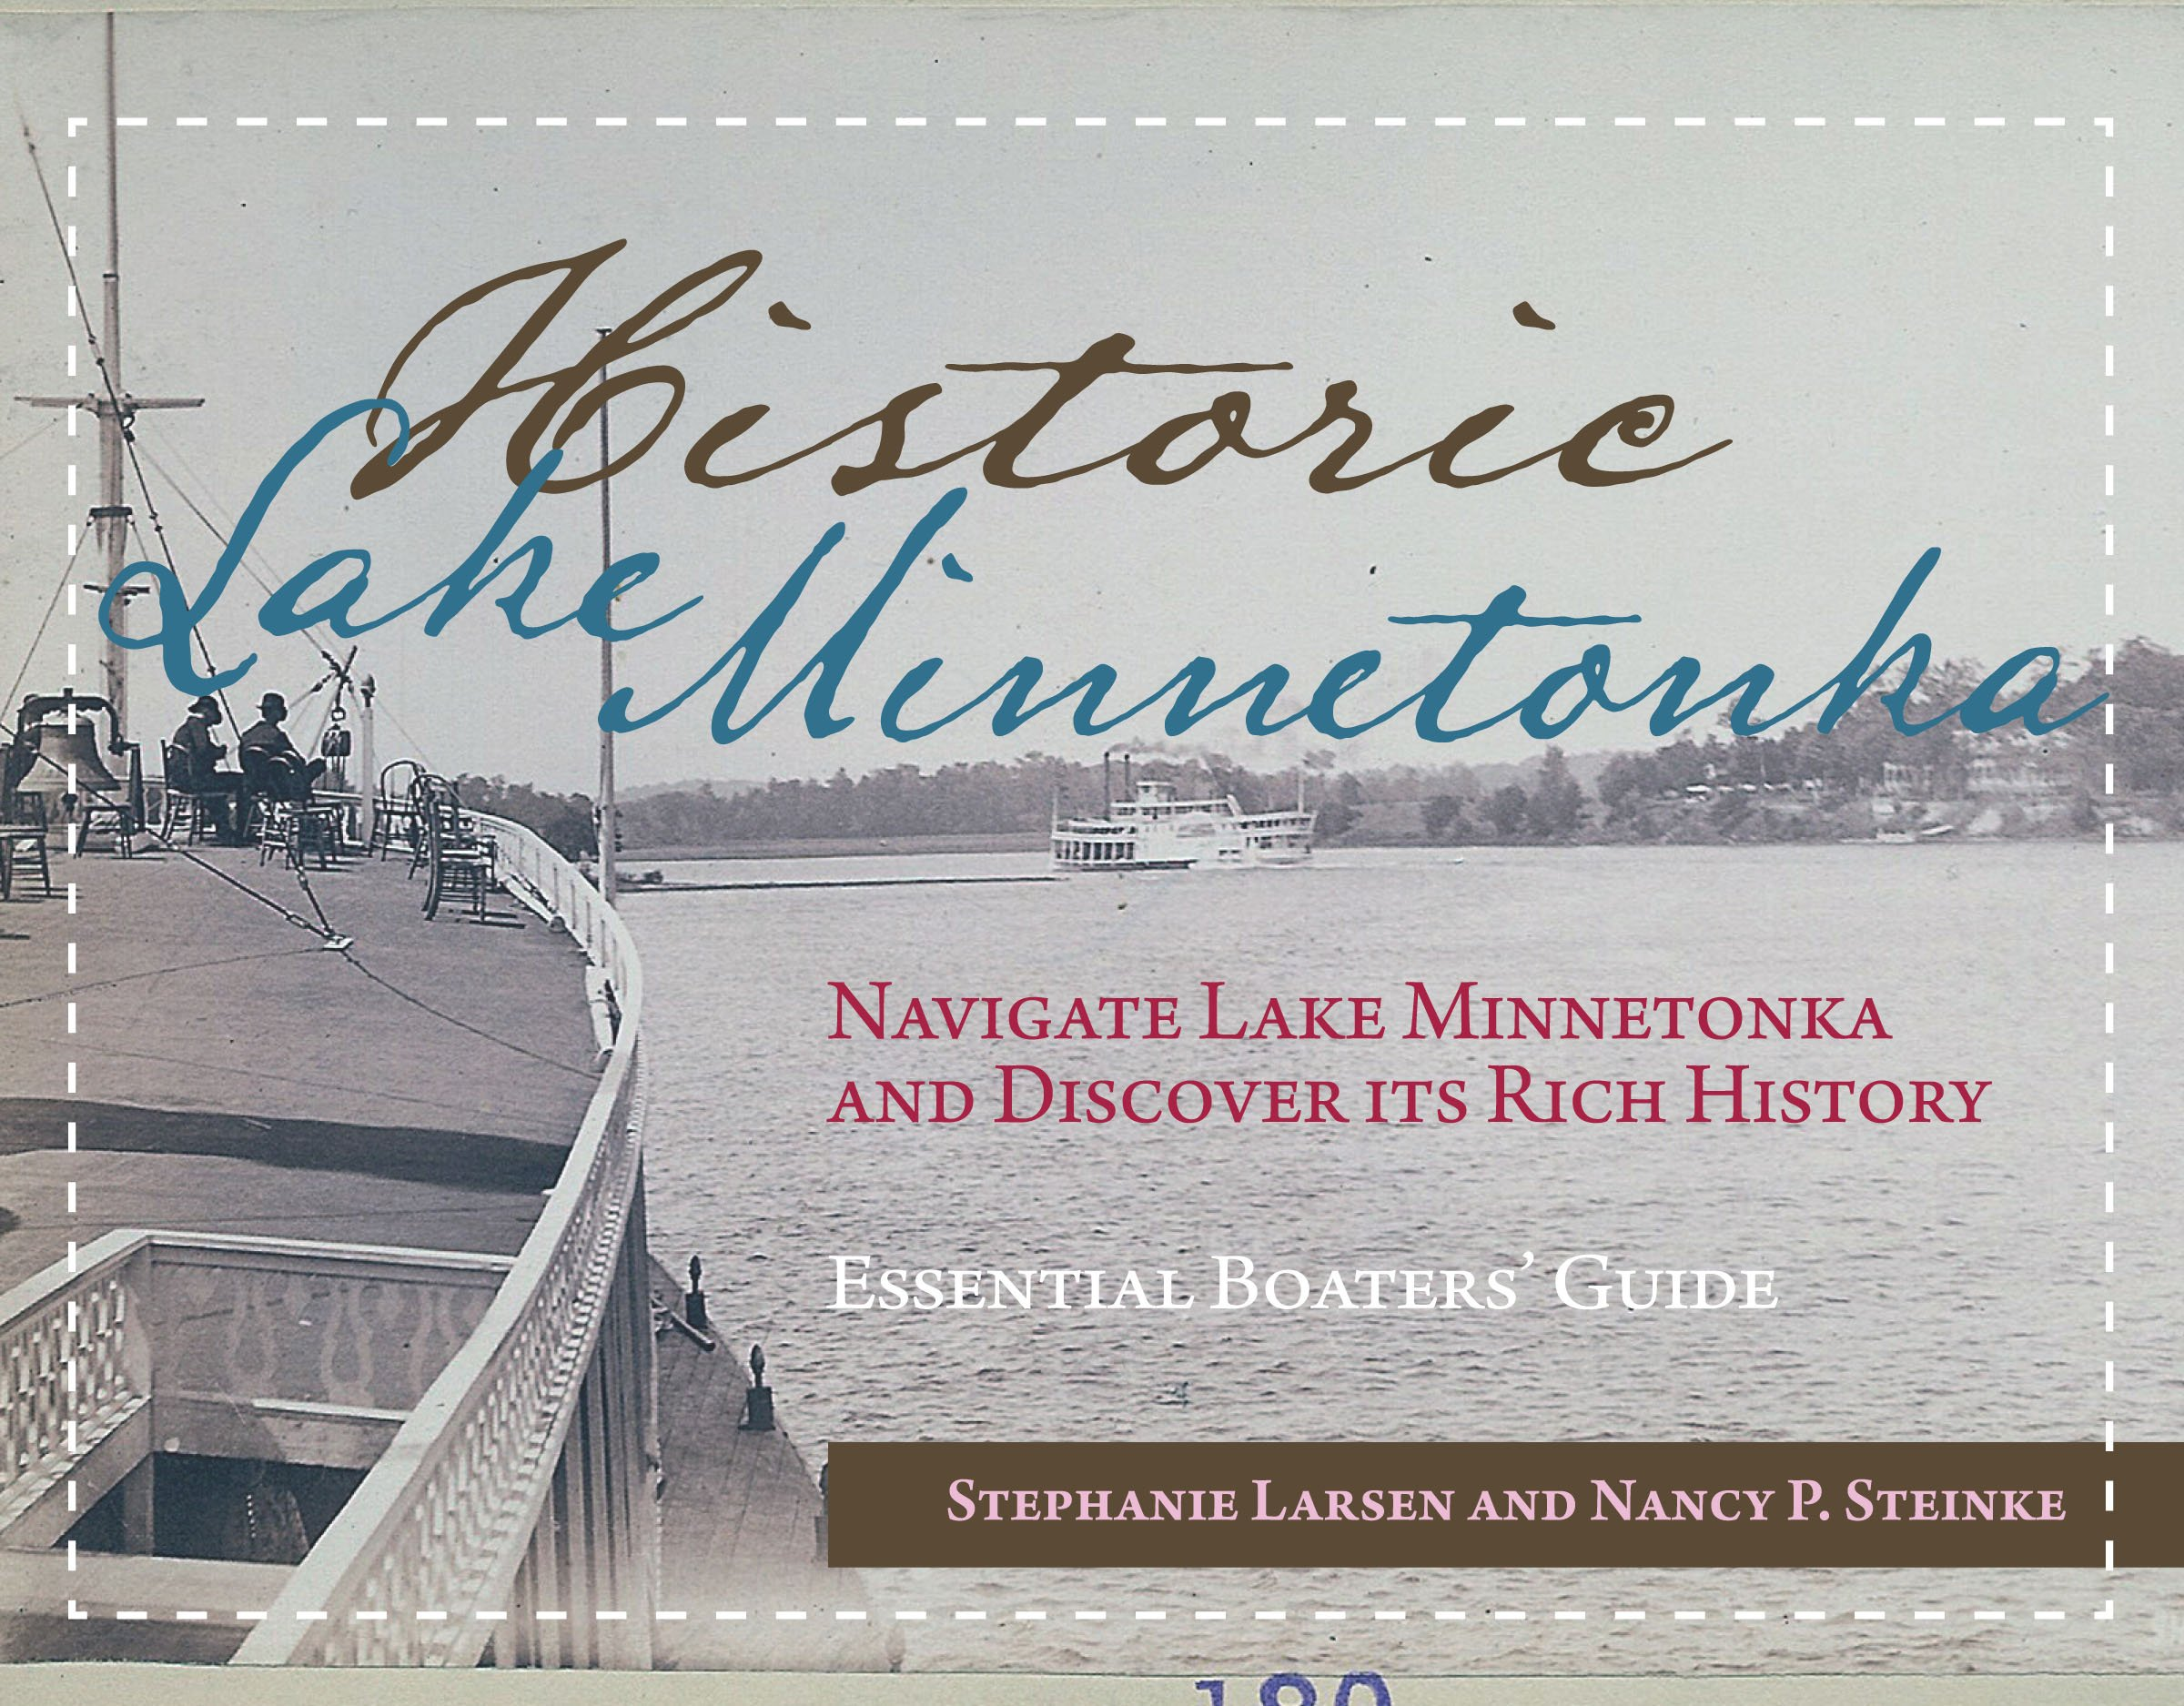 Historic Lake Minnetonka Navigate Lake Minnetonka and Discover Its Rich History (Essential Boaters' Guide) by Stephanie Larsen/Nancy Steinke